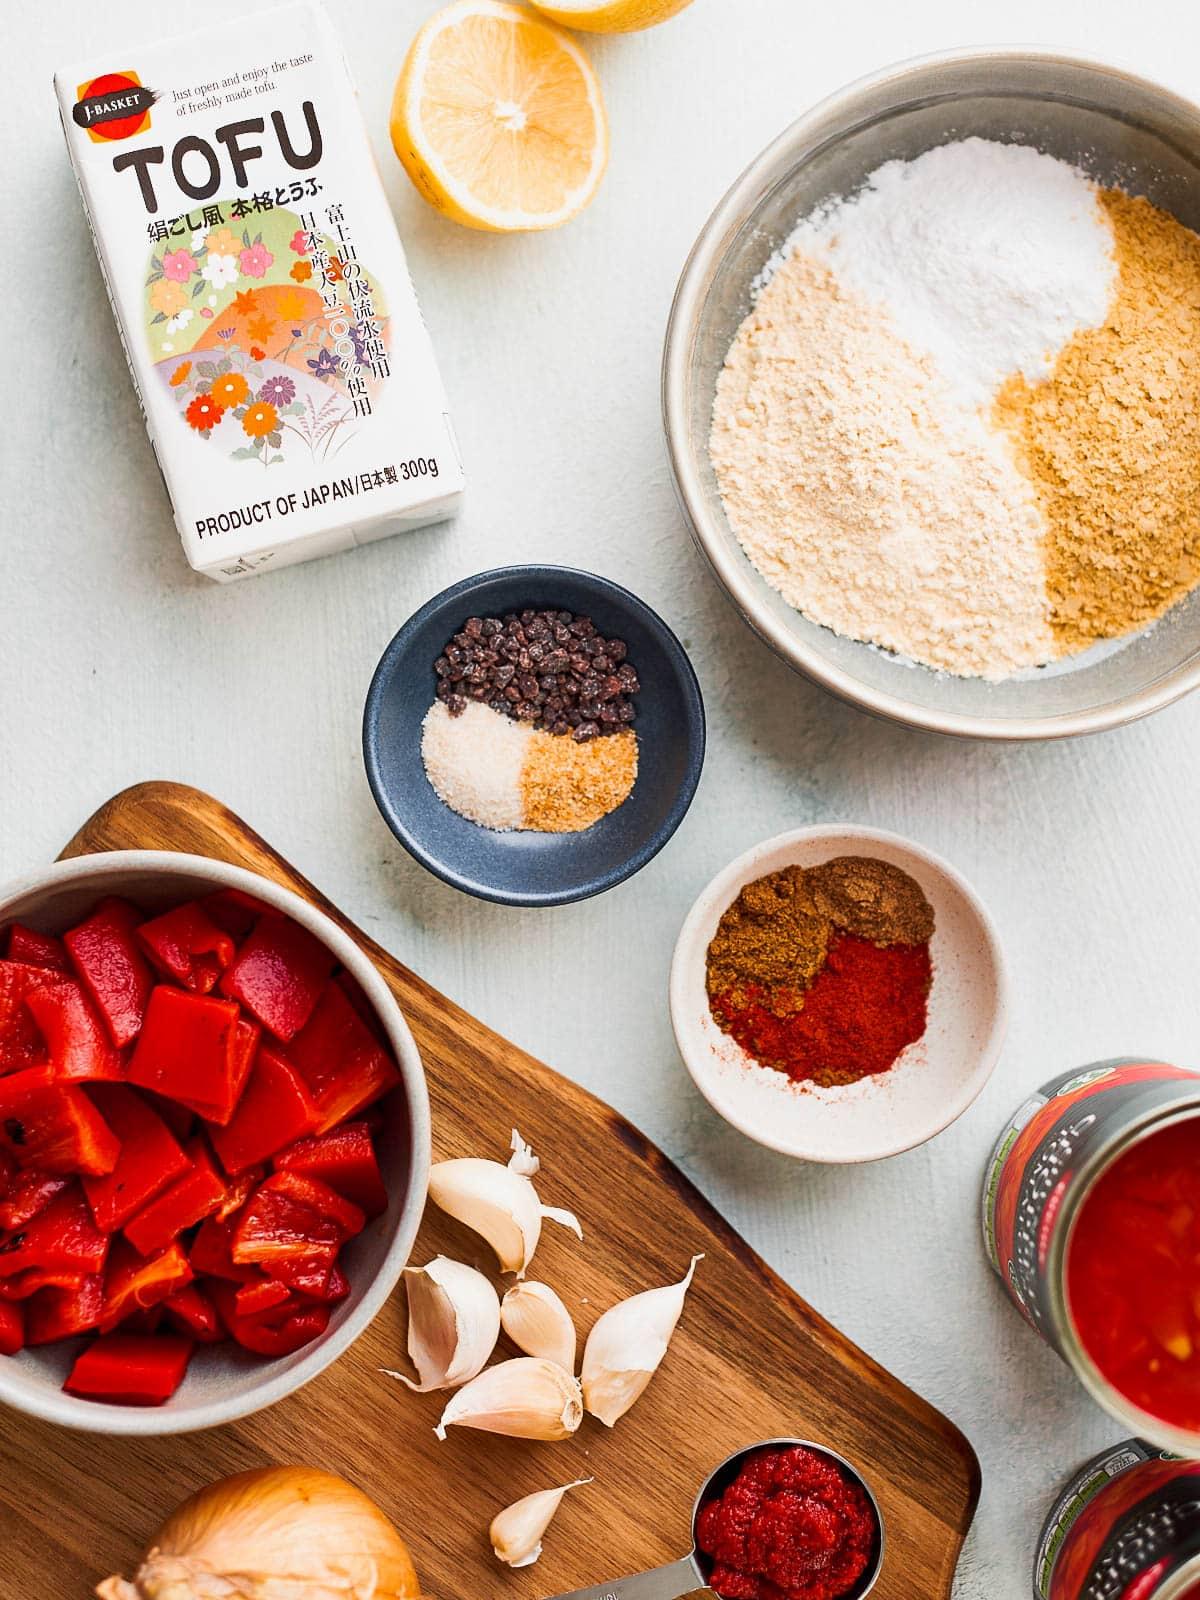 Ingredients flatlay for tofu shakshuka